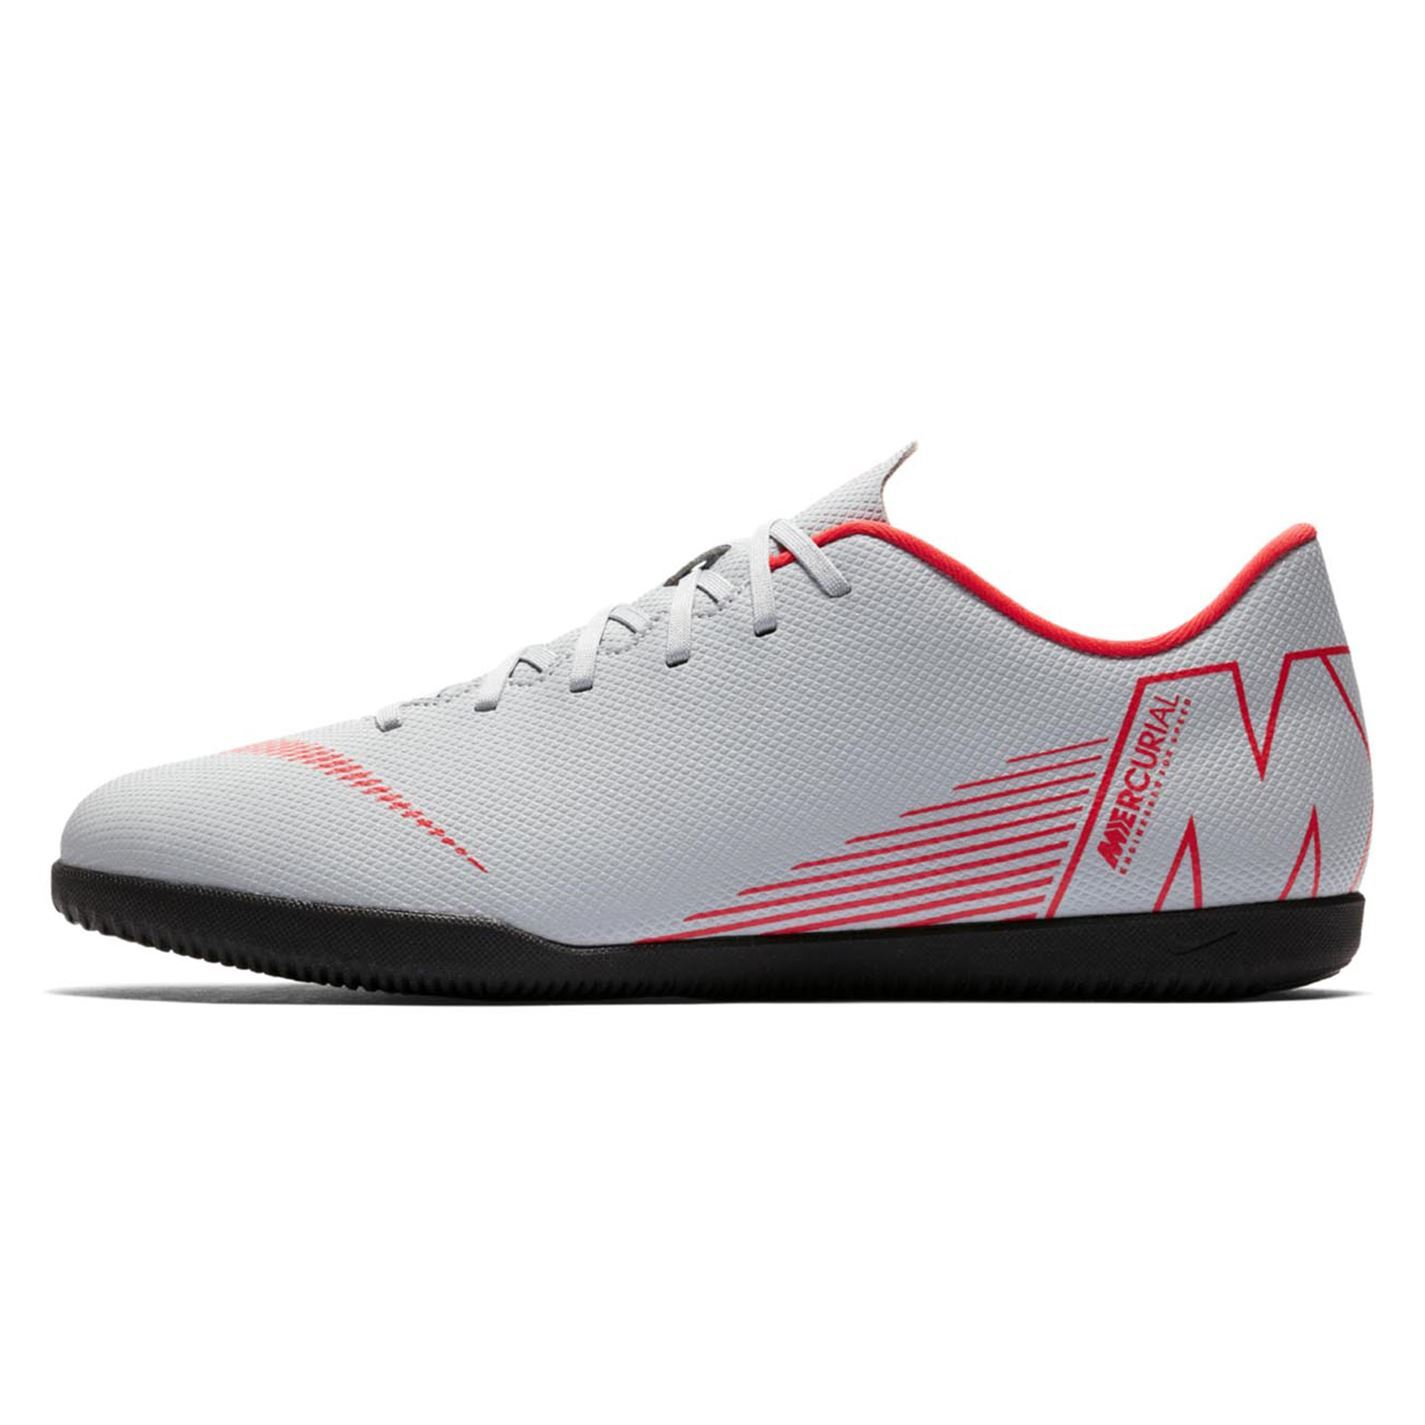 a608f9ffefa Nike Mercurial Vapor Club Indoor Football Trainers Mens Soccer ...